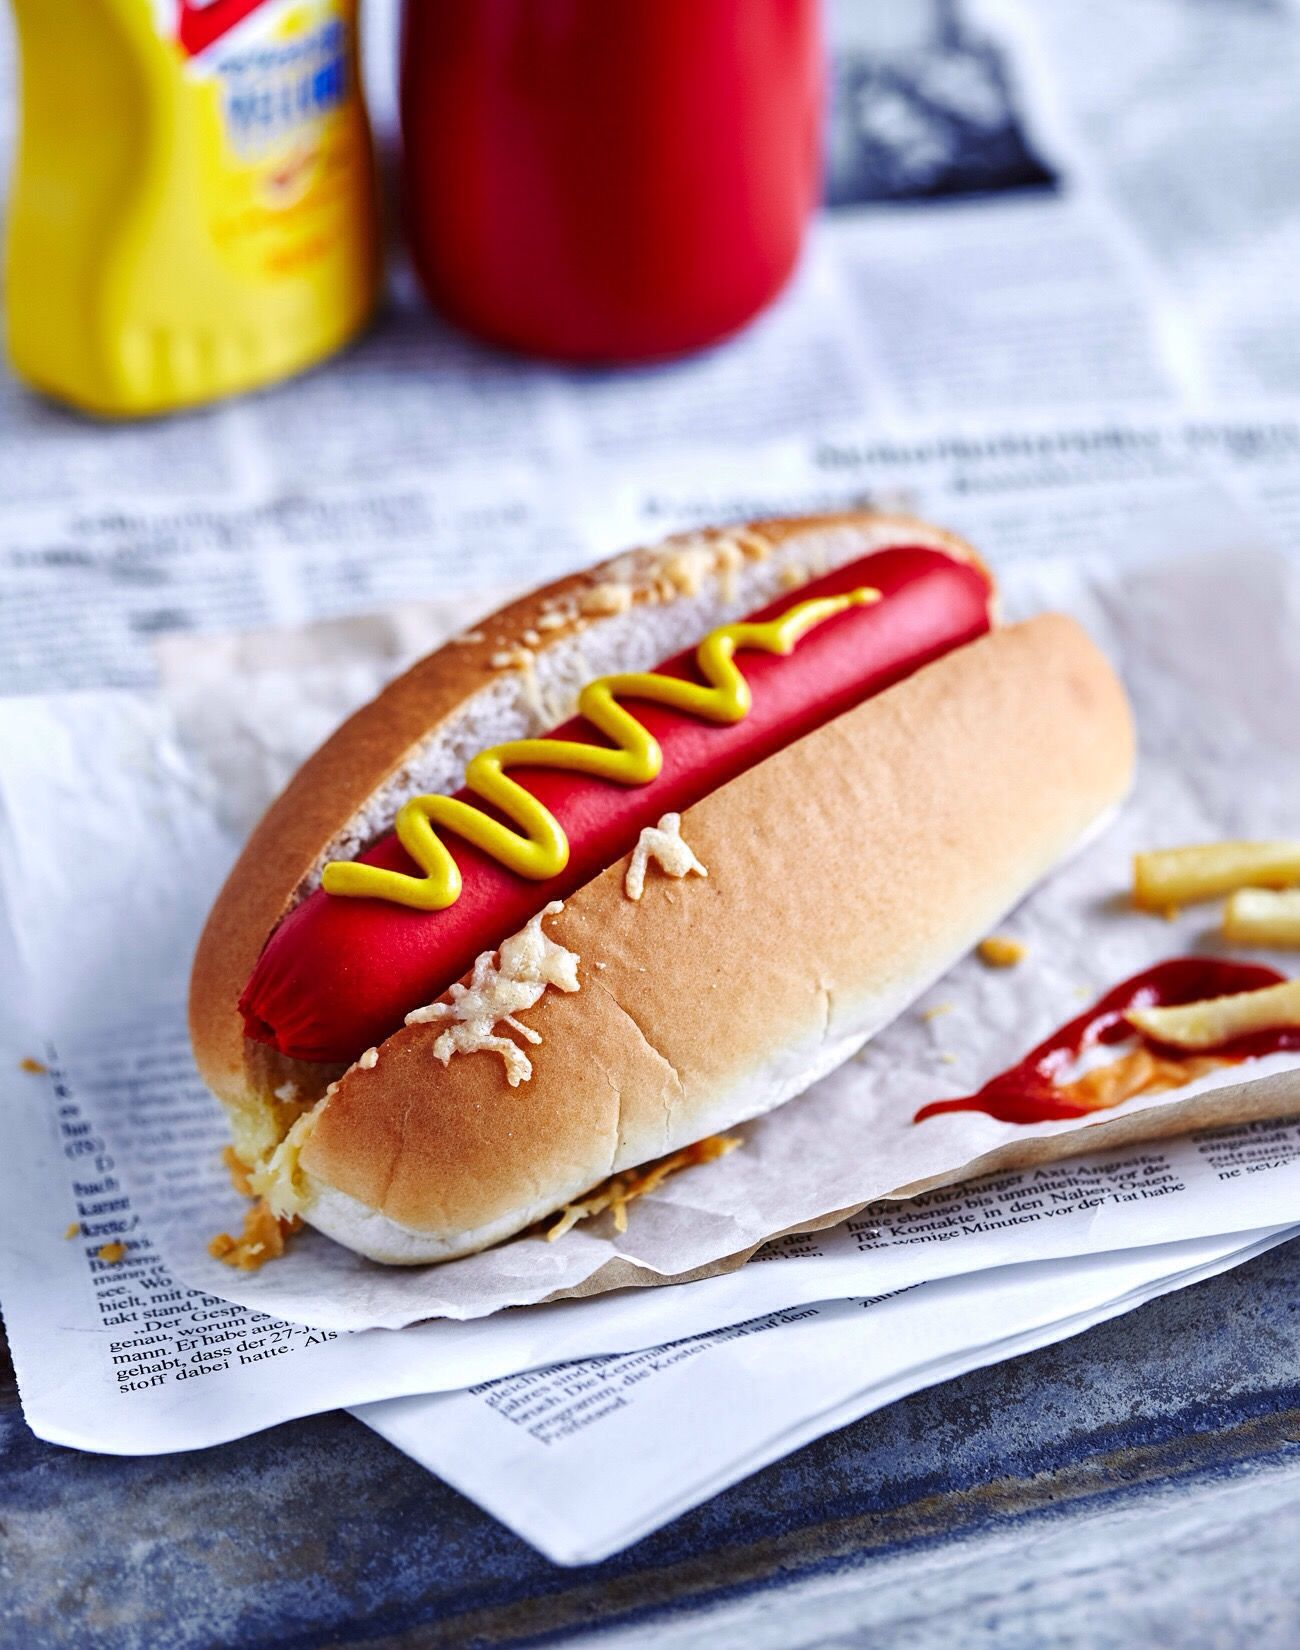 Dawg HotDog Food Foodphotography Foodporn Mustard Sydney Australia Laura Jenkins